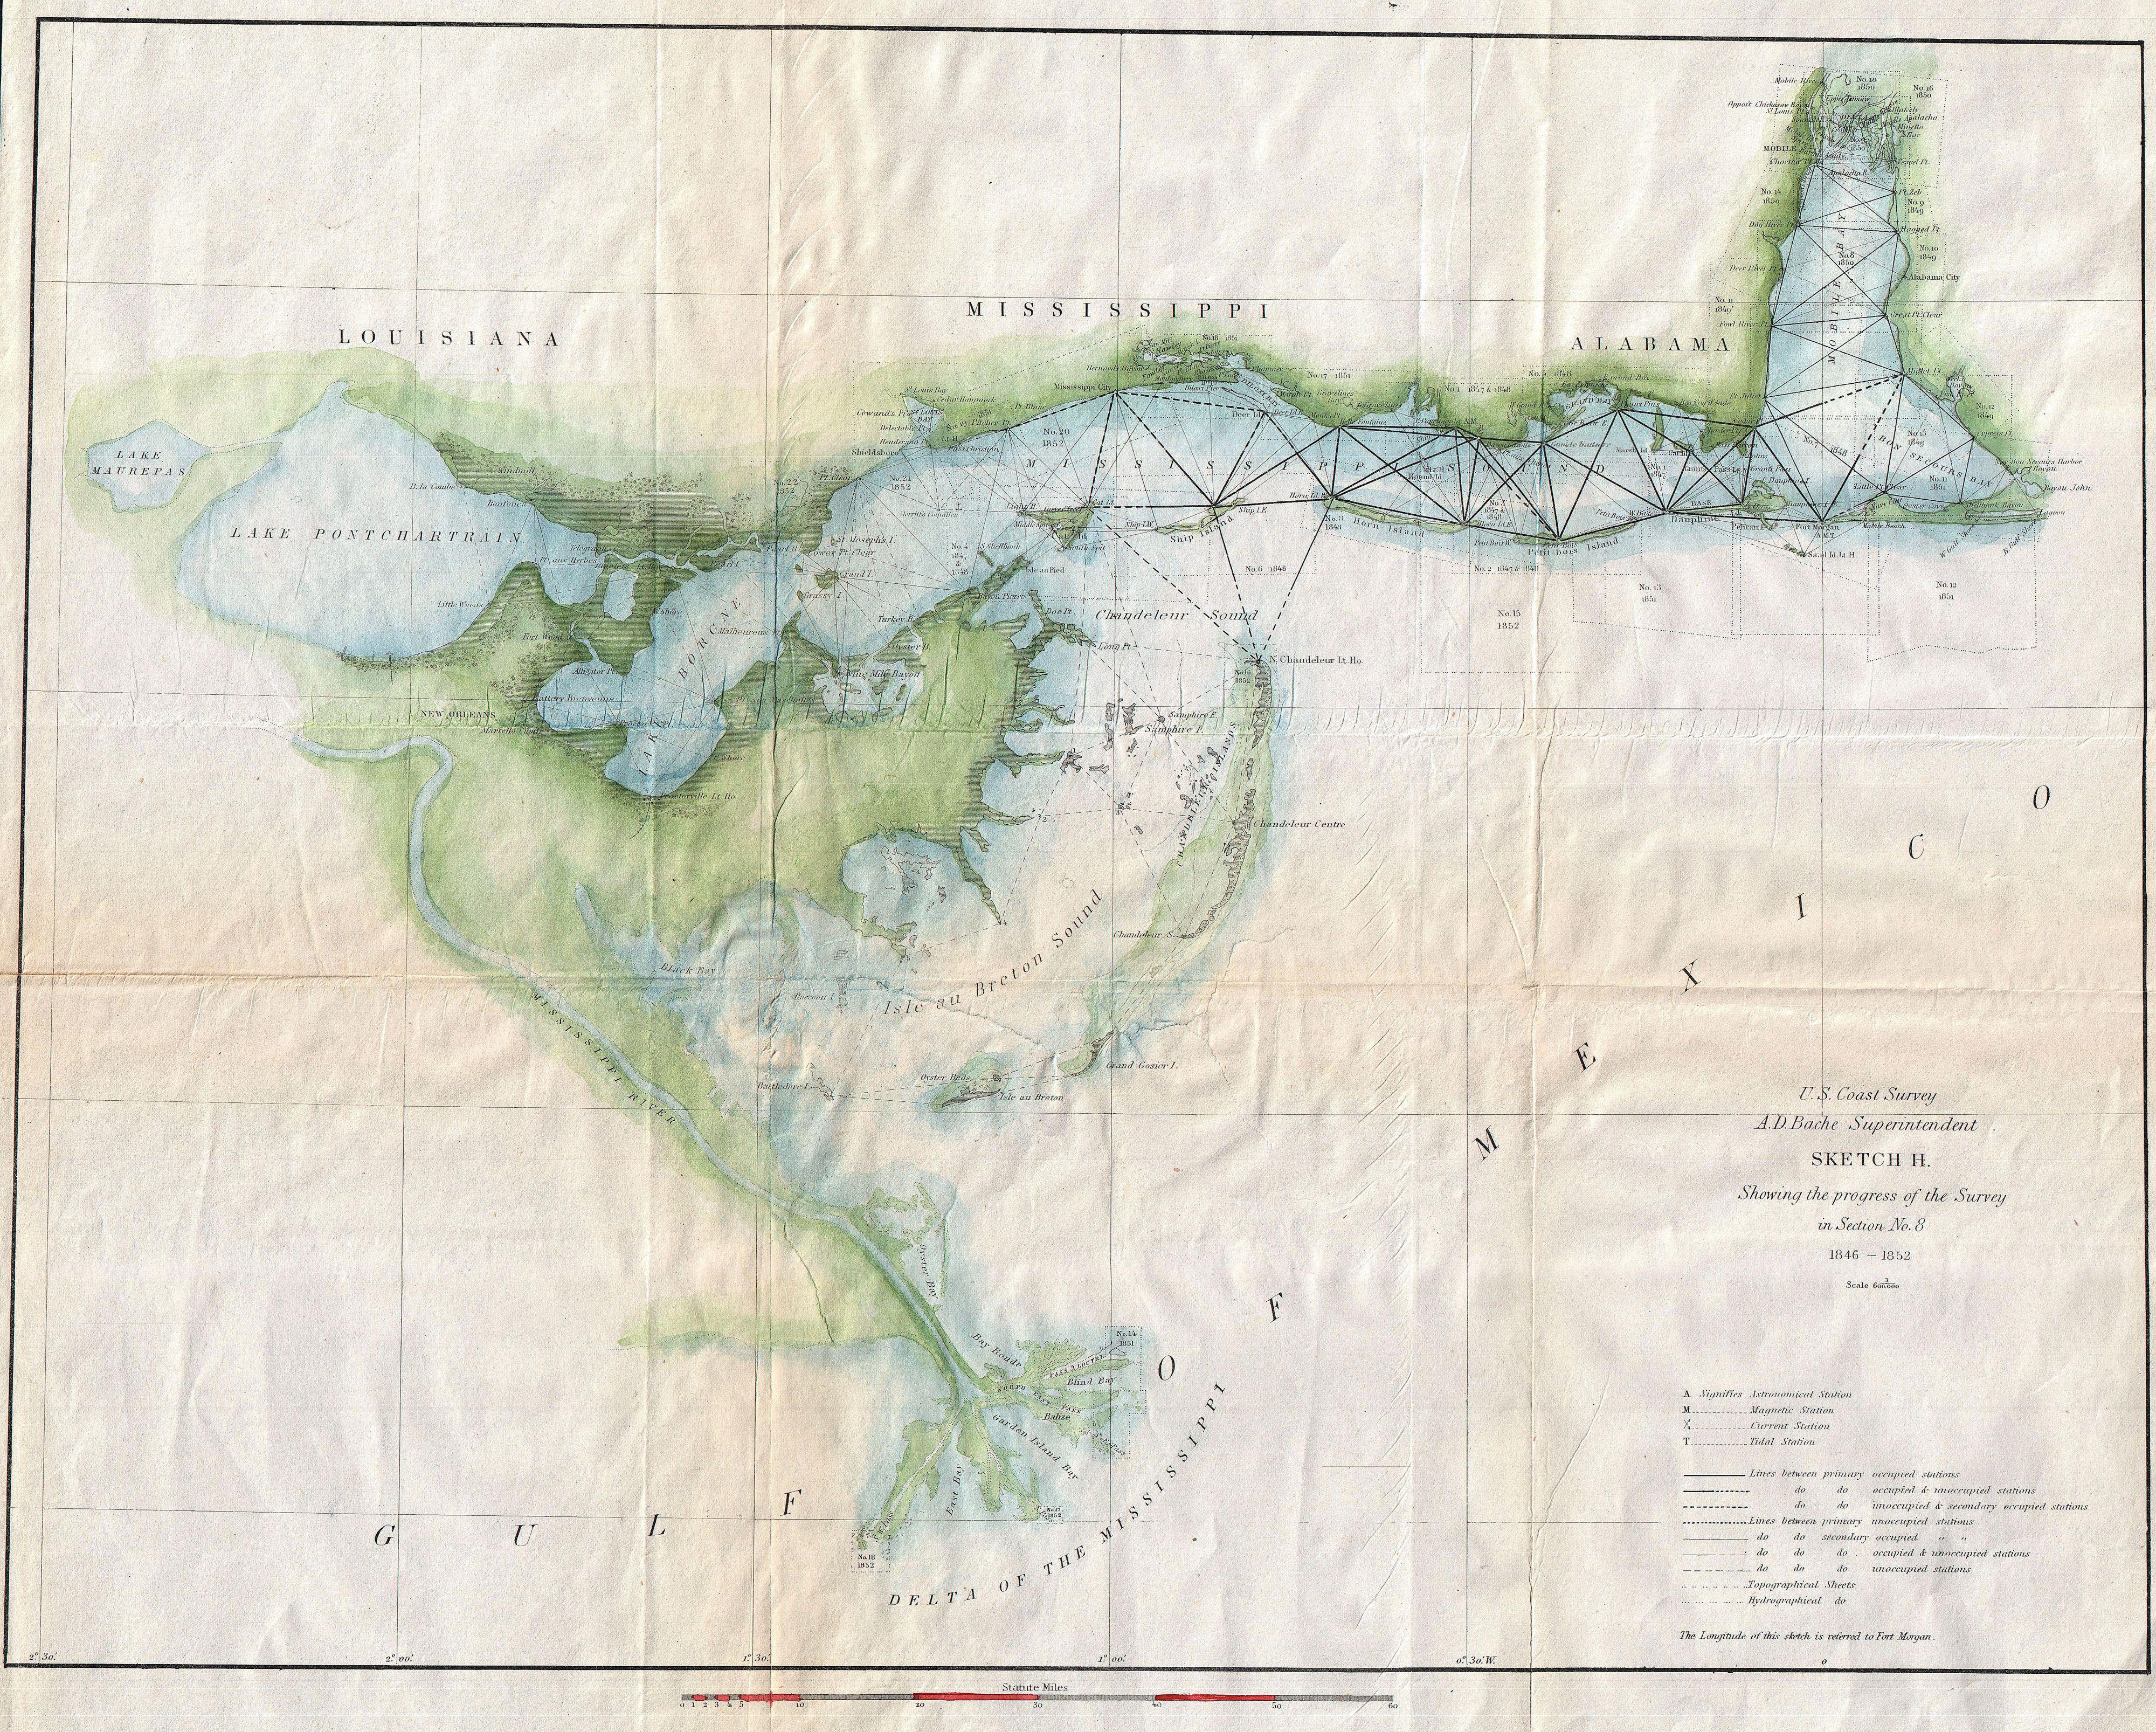 File:1853 U.S. Coast Survey Map of Lake Pontchartrain, New Orleans on